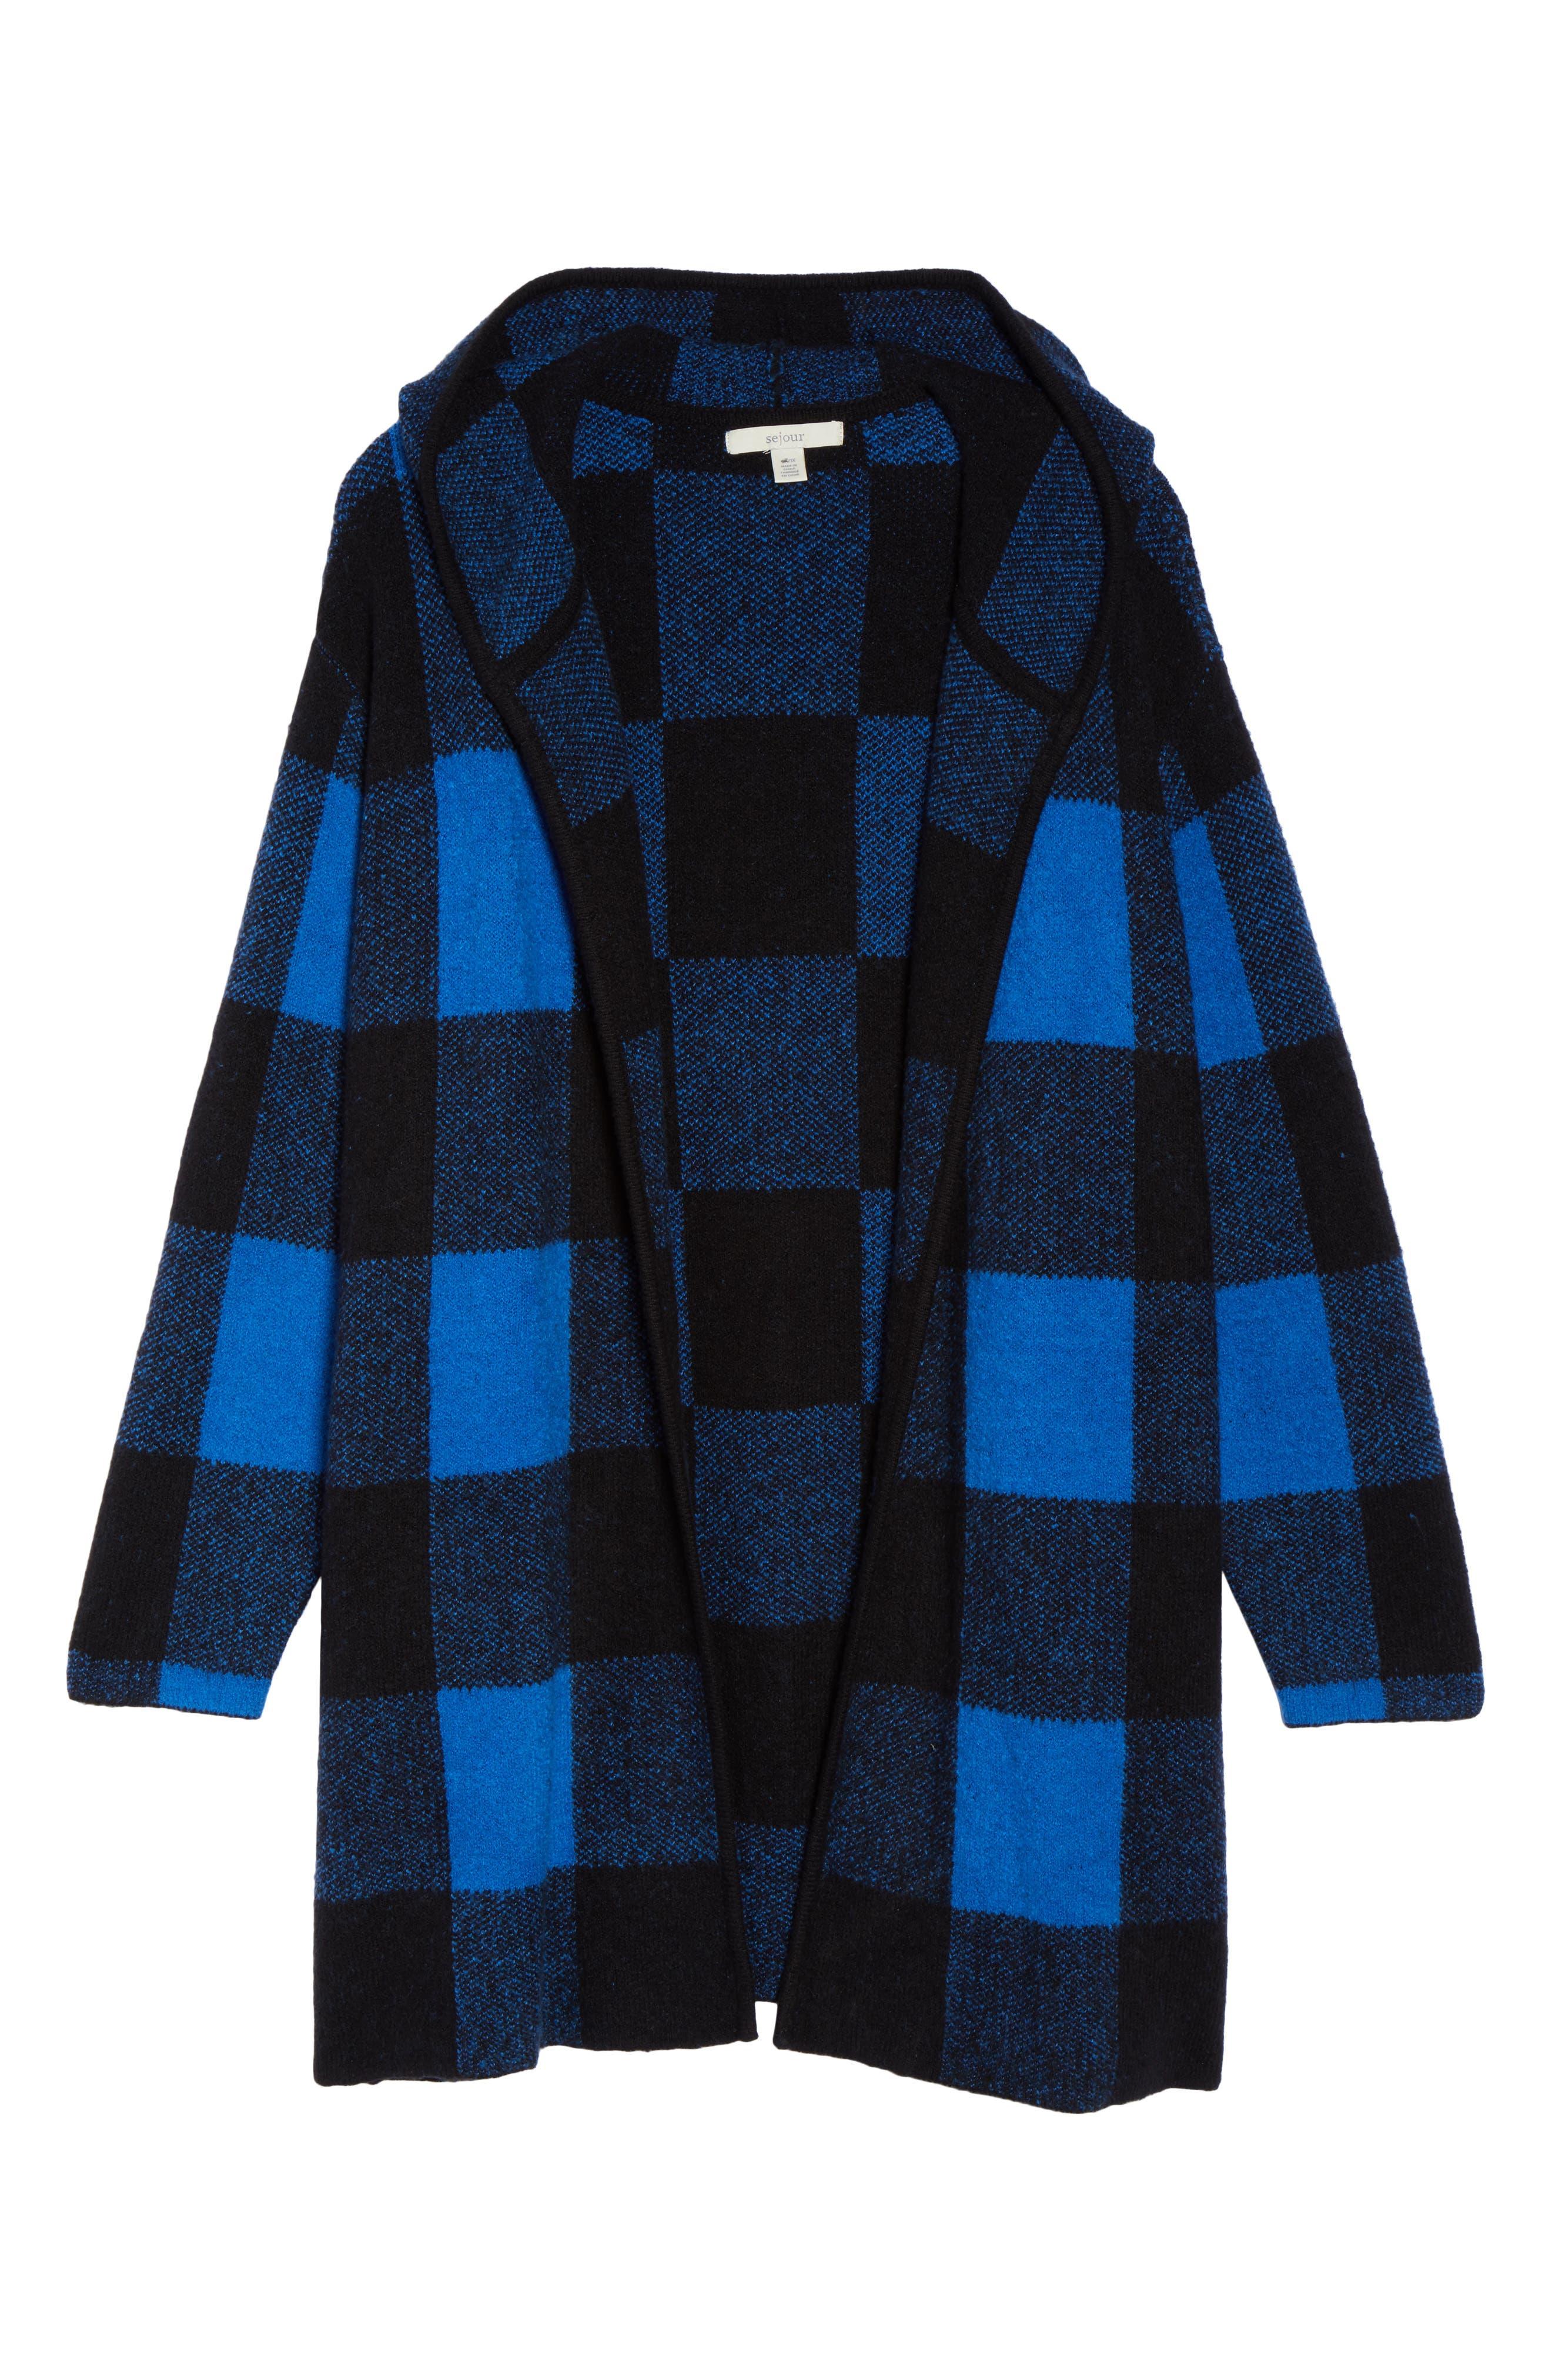 Plaid Hooded Sweater Coatigan,                             Alternate thumbnail 6, color,                             Blue Checkerboard Jacquard